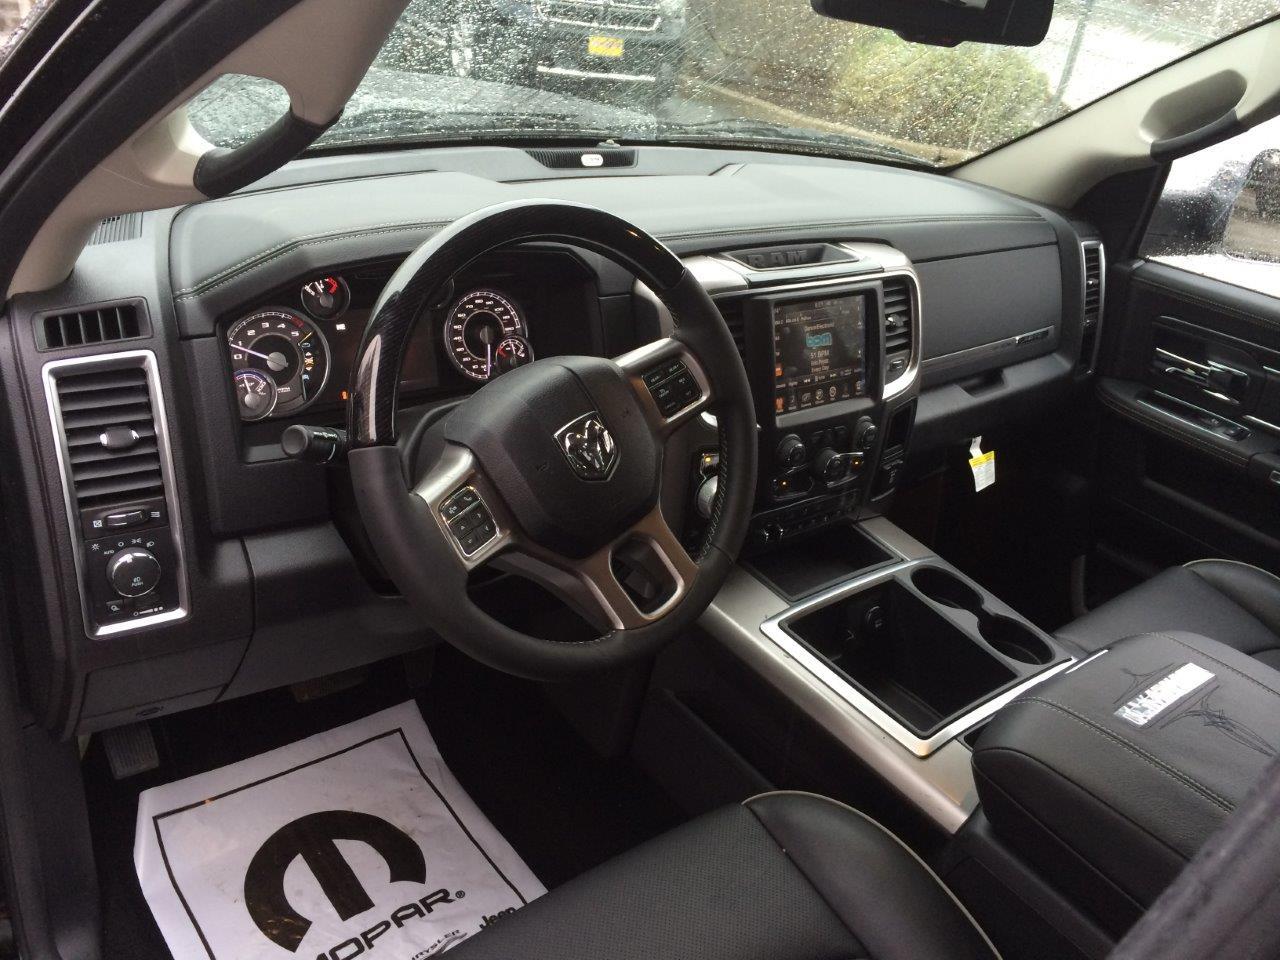 2014 ram 1500 ecodiesel laramie limited edition crew cab 4x4 img_1195 jpg